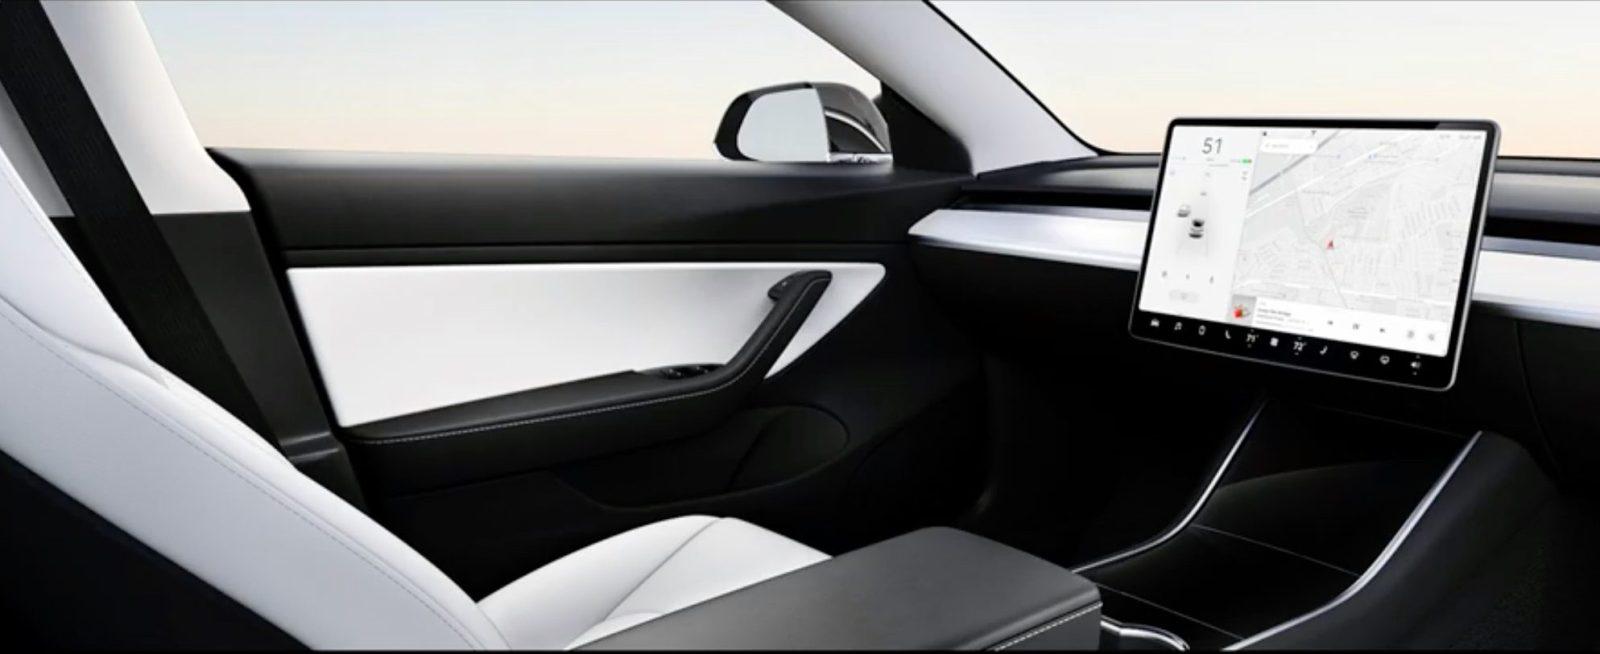 tesla unveils car design